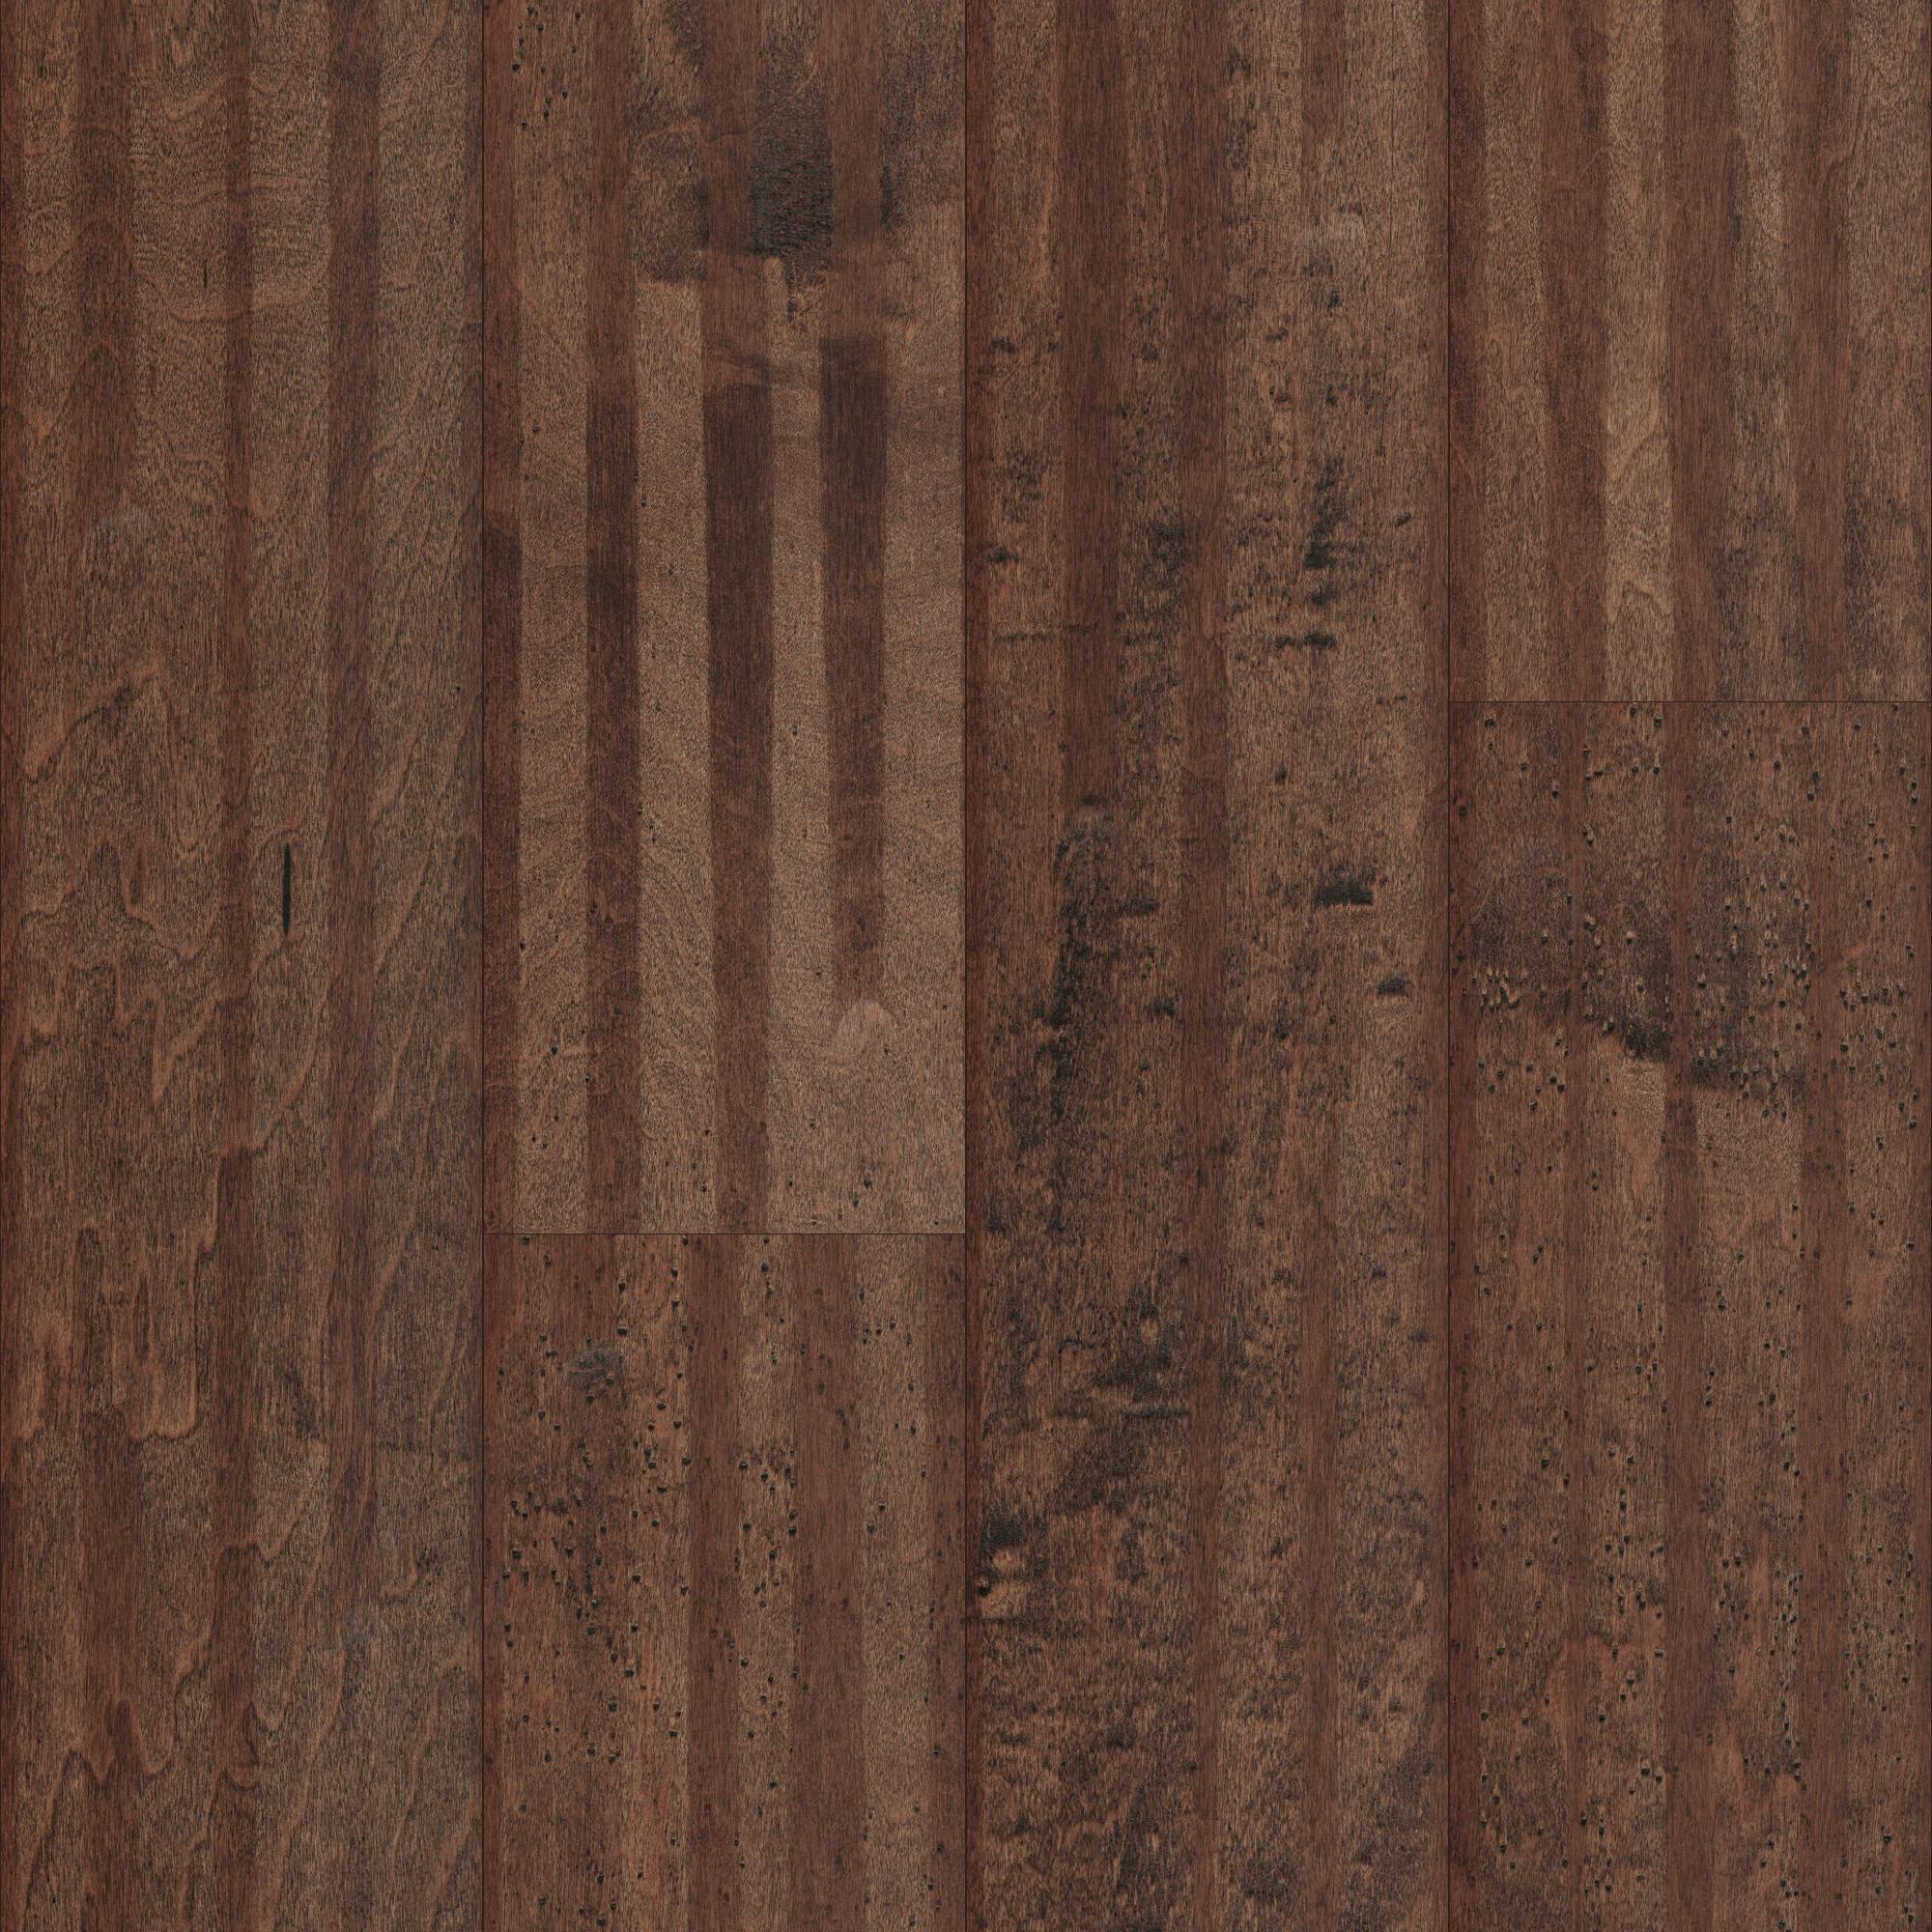 imperial walnut hardwood flooring of laminate wood flooring sale floor plan ideas pertaining to laminate wood flooring sale mullican lincolnshire sculpted maple autumn 5